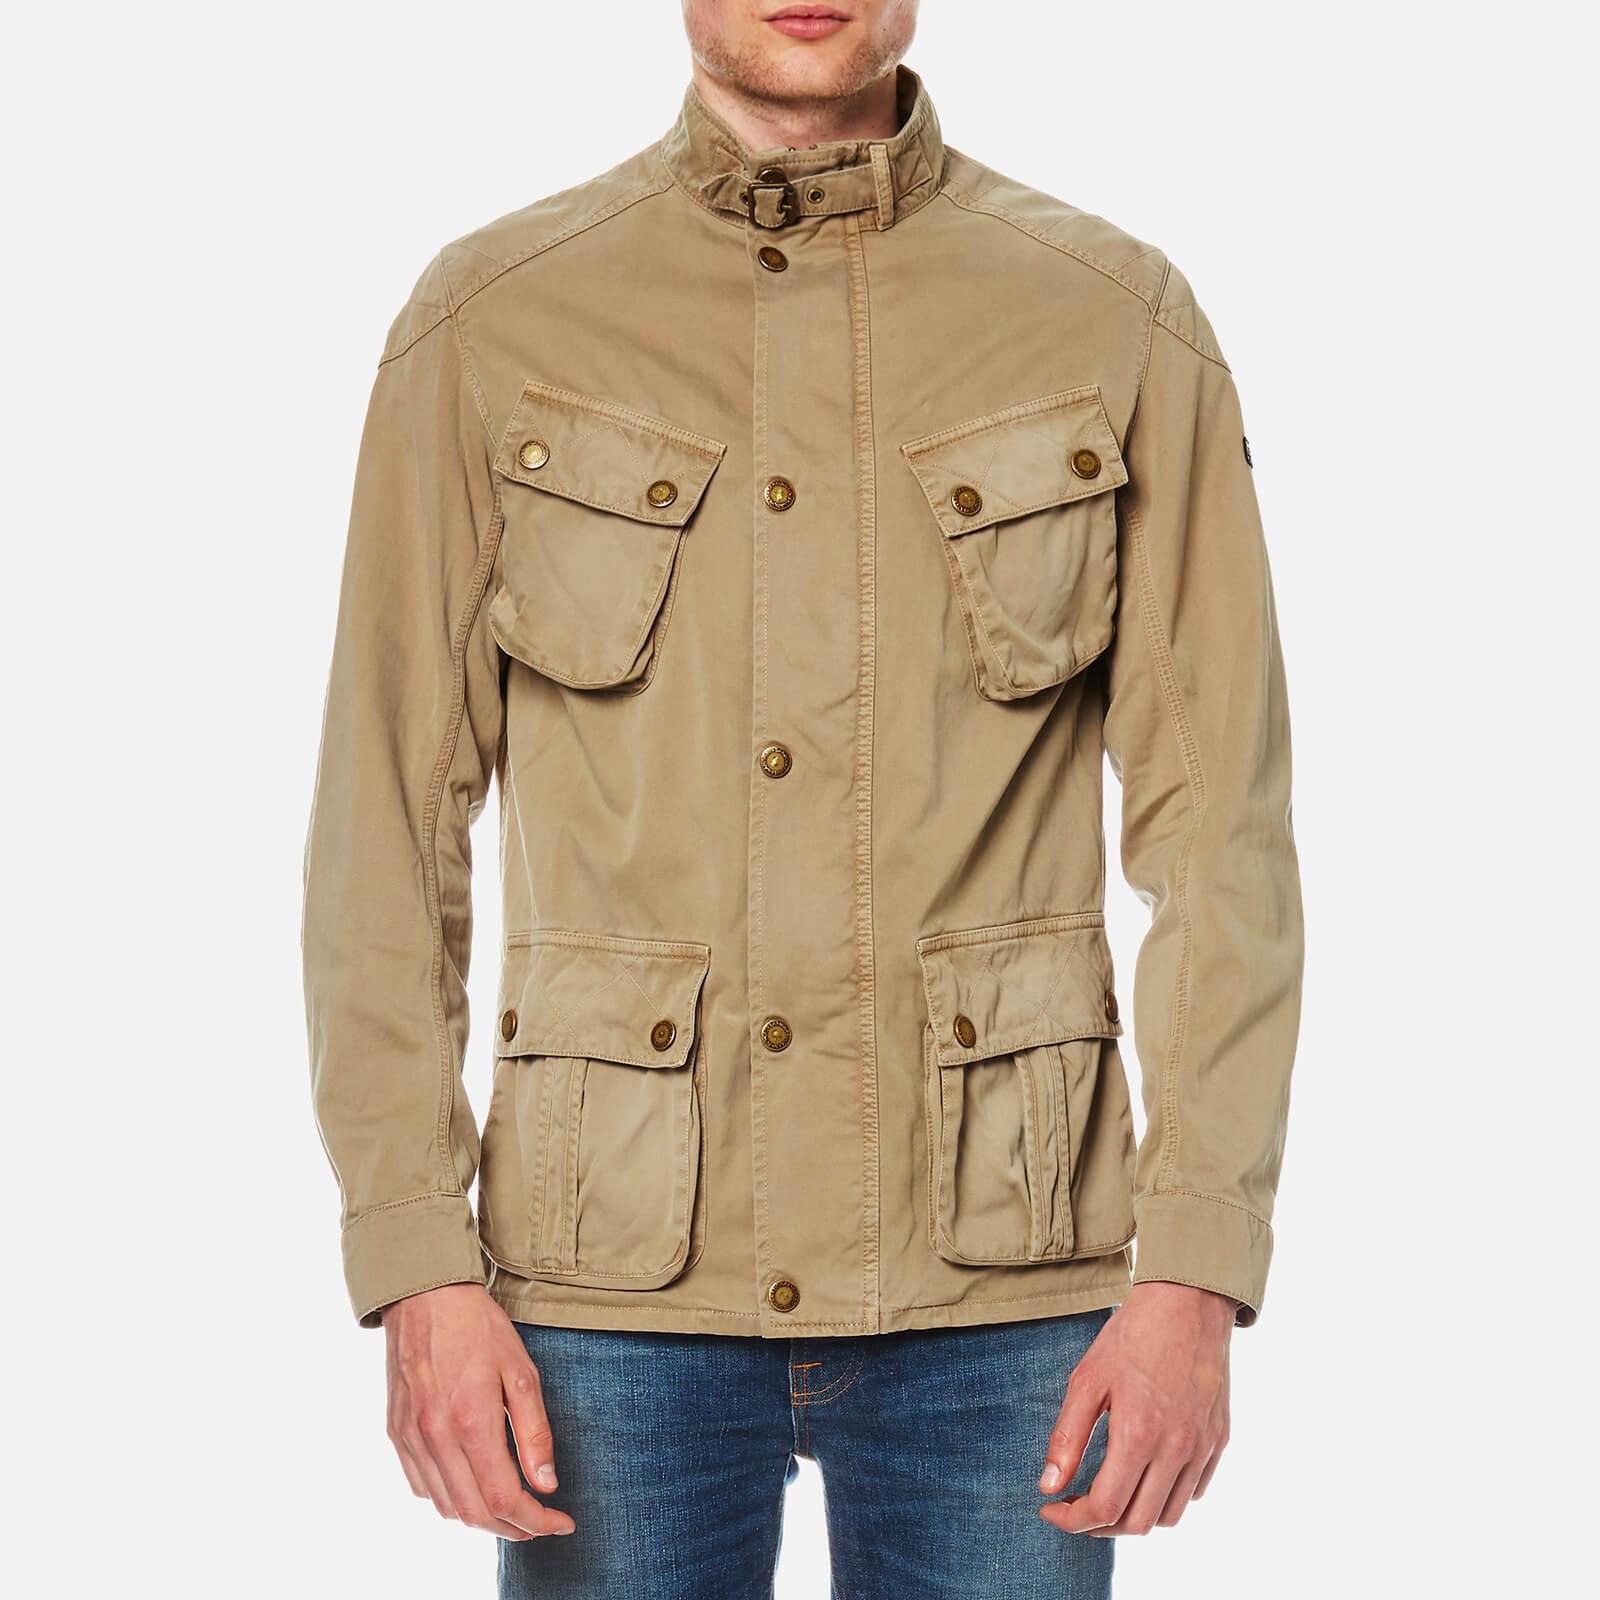 d24c3c5a3b9471 barbour casual jacket mens Orange sale   OFF79% Discounted